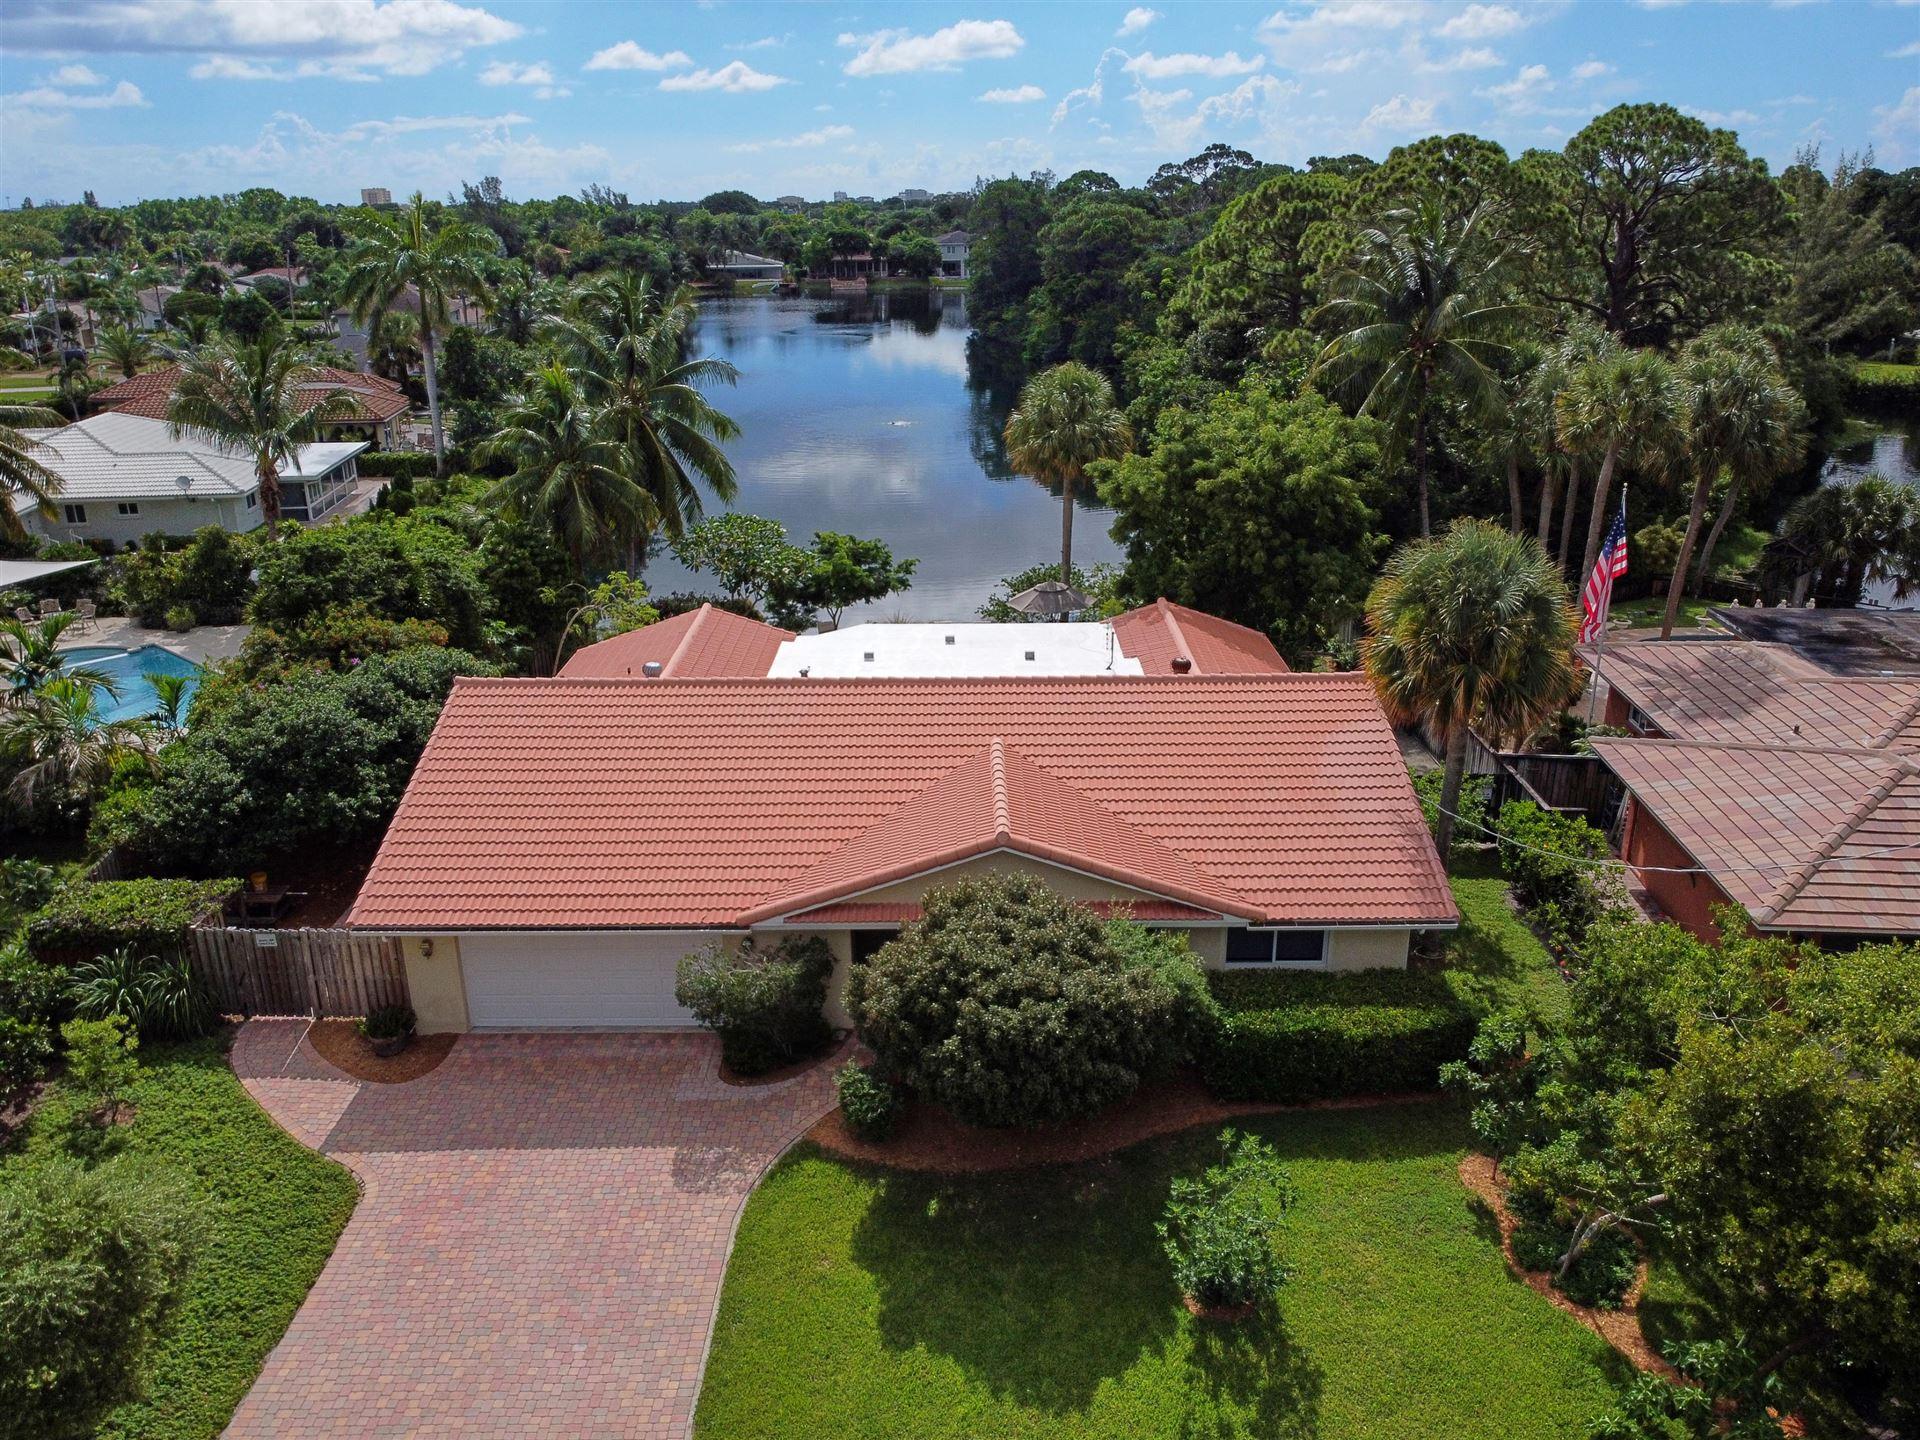 372 Paulus Court, Boca Raton, FL 33486 - MLS#: RX-10735863